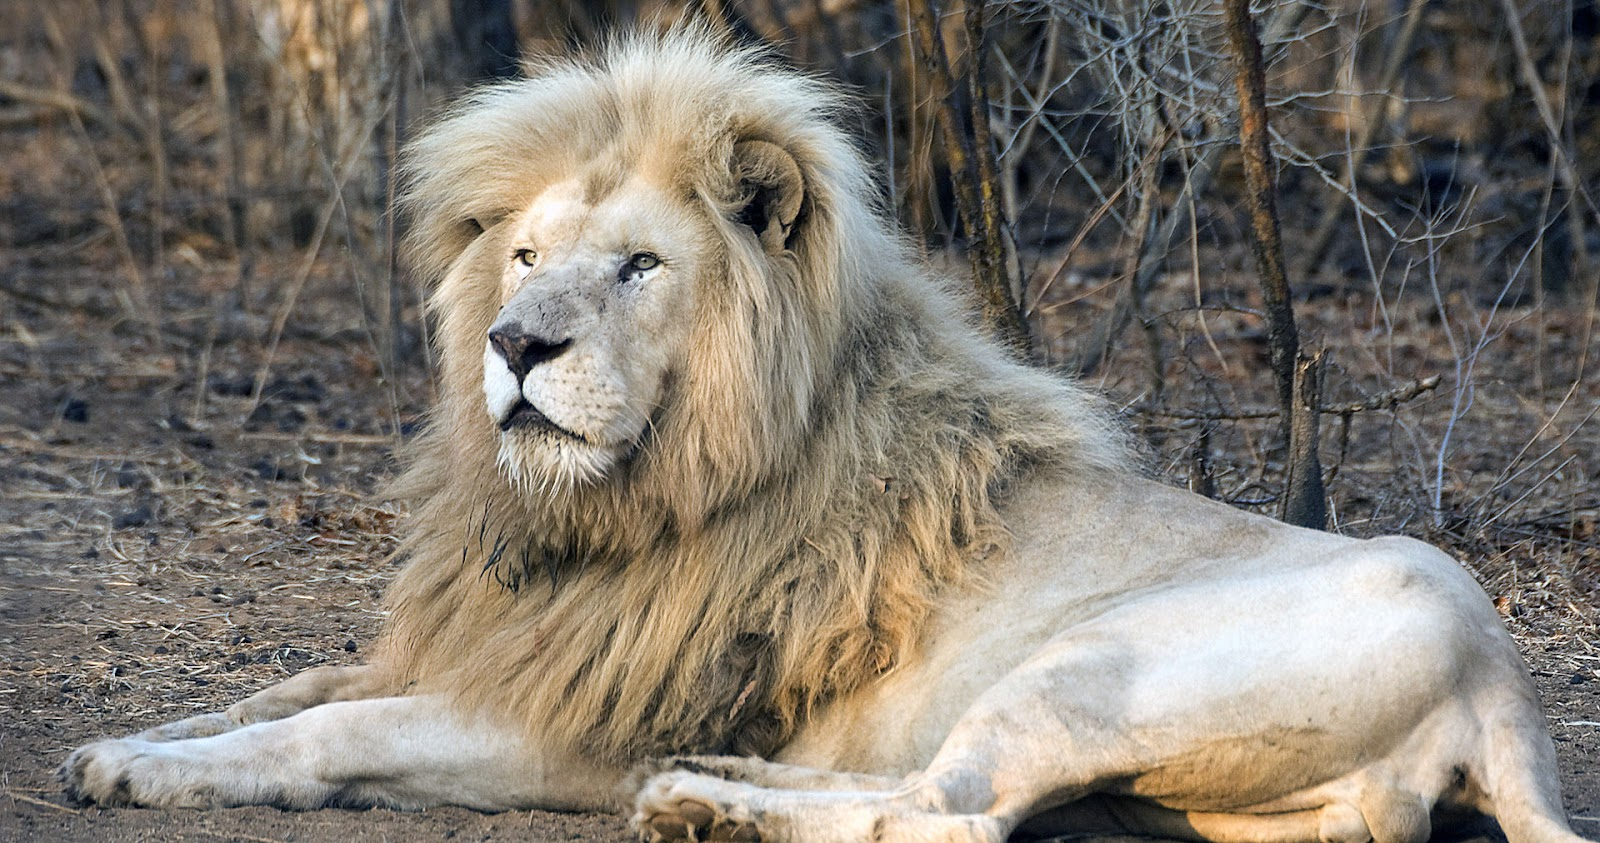 Lion Full Hd 1080p Wallpapers Latestwallpaper99